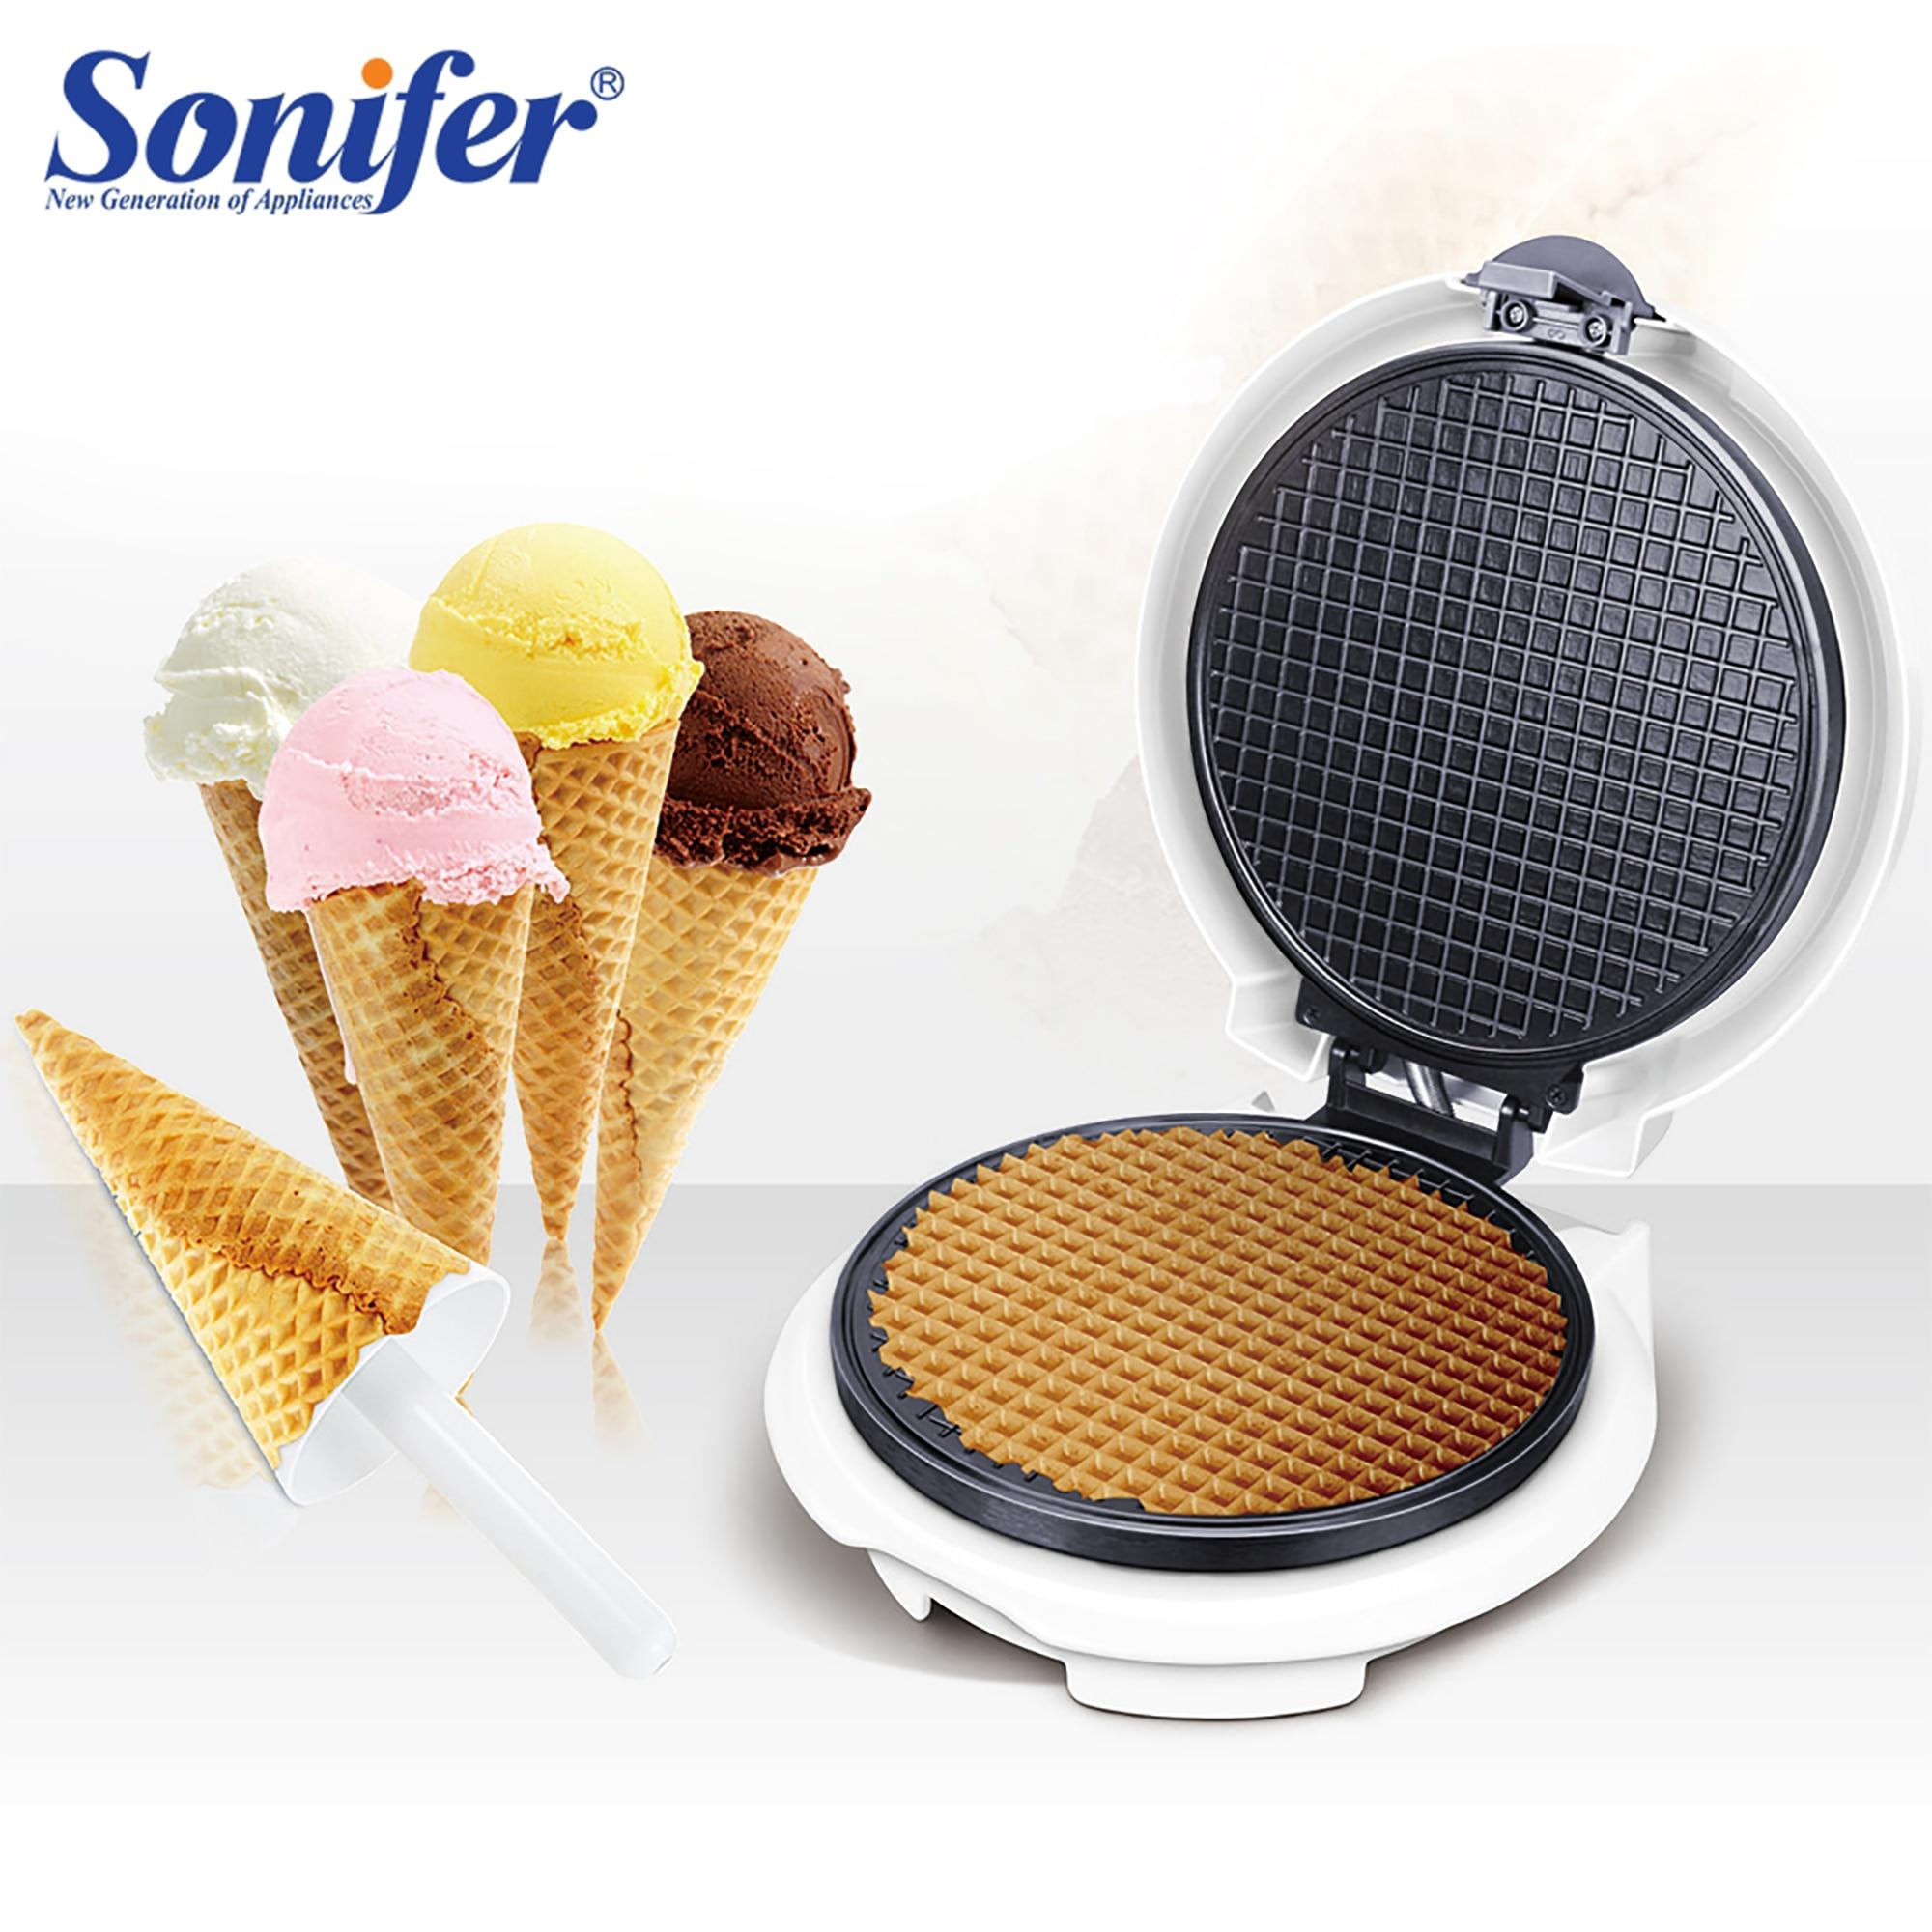 Electric Egg Roll Maker Crispy Omelet Mold Crepe Baking Pan Pancake Bakeware DIY Ice Cream Cone